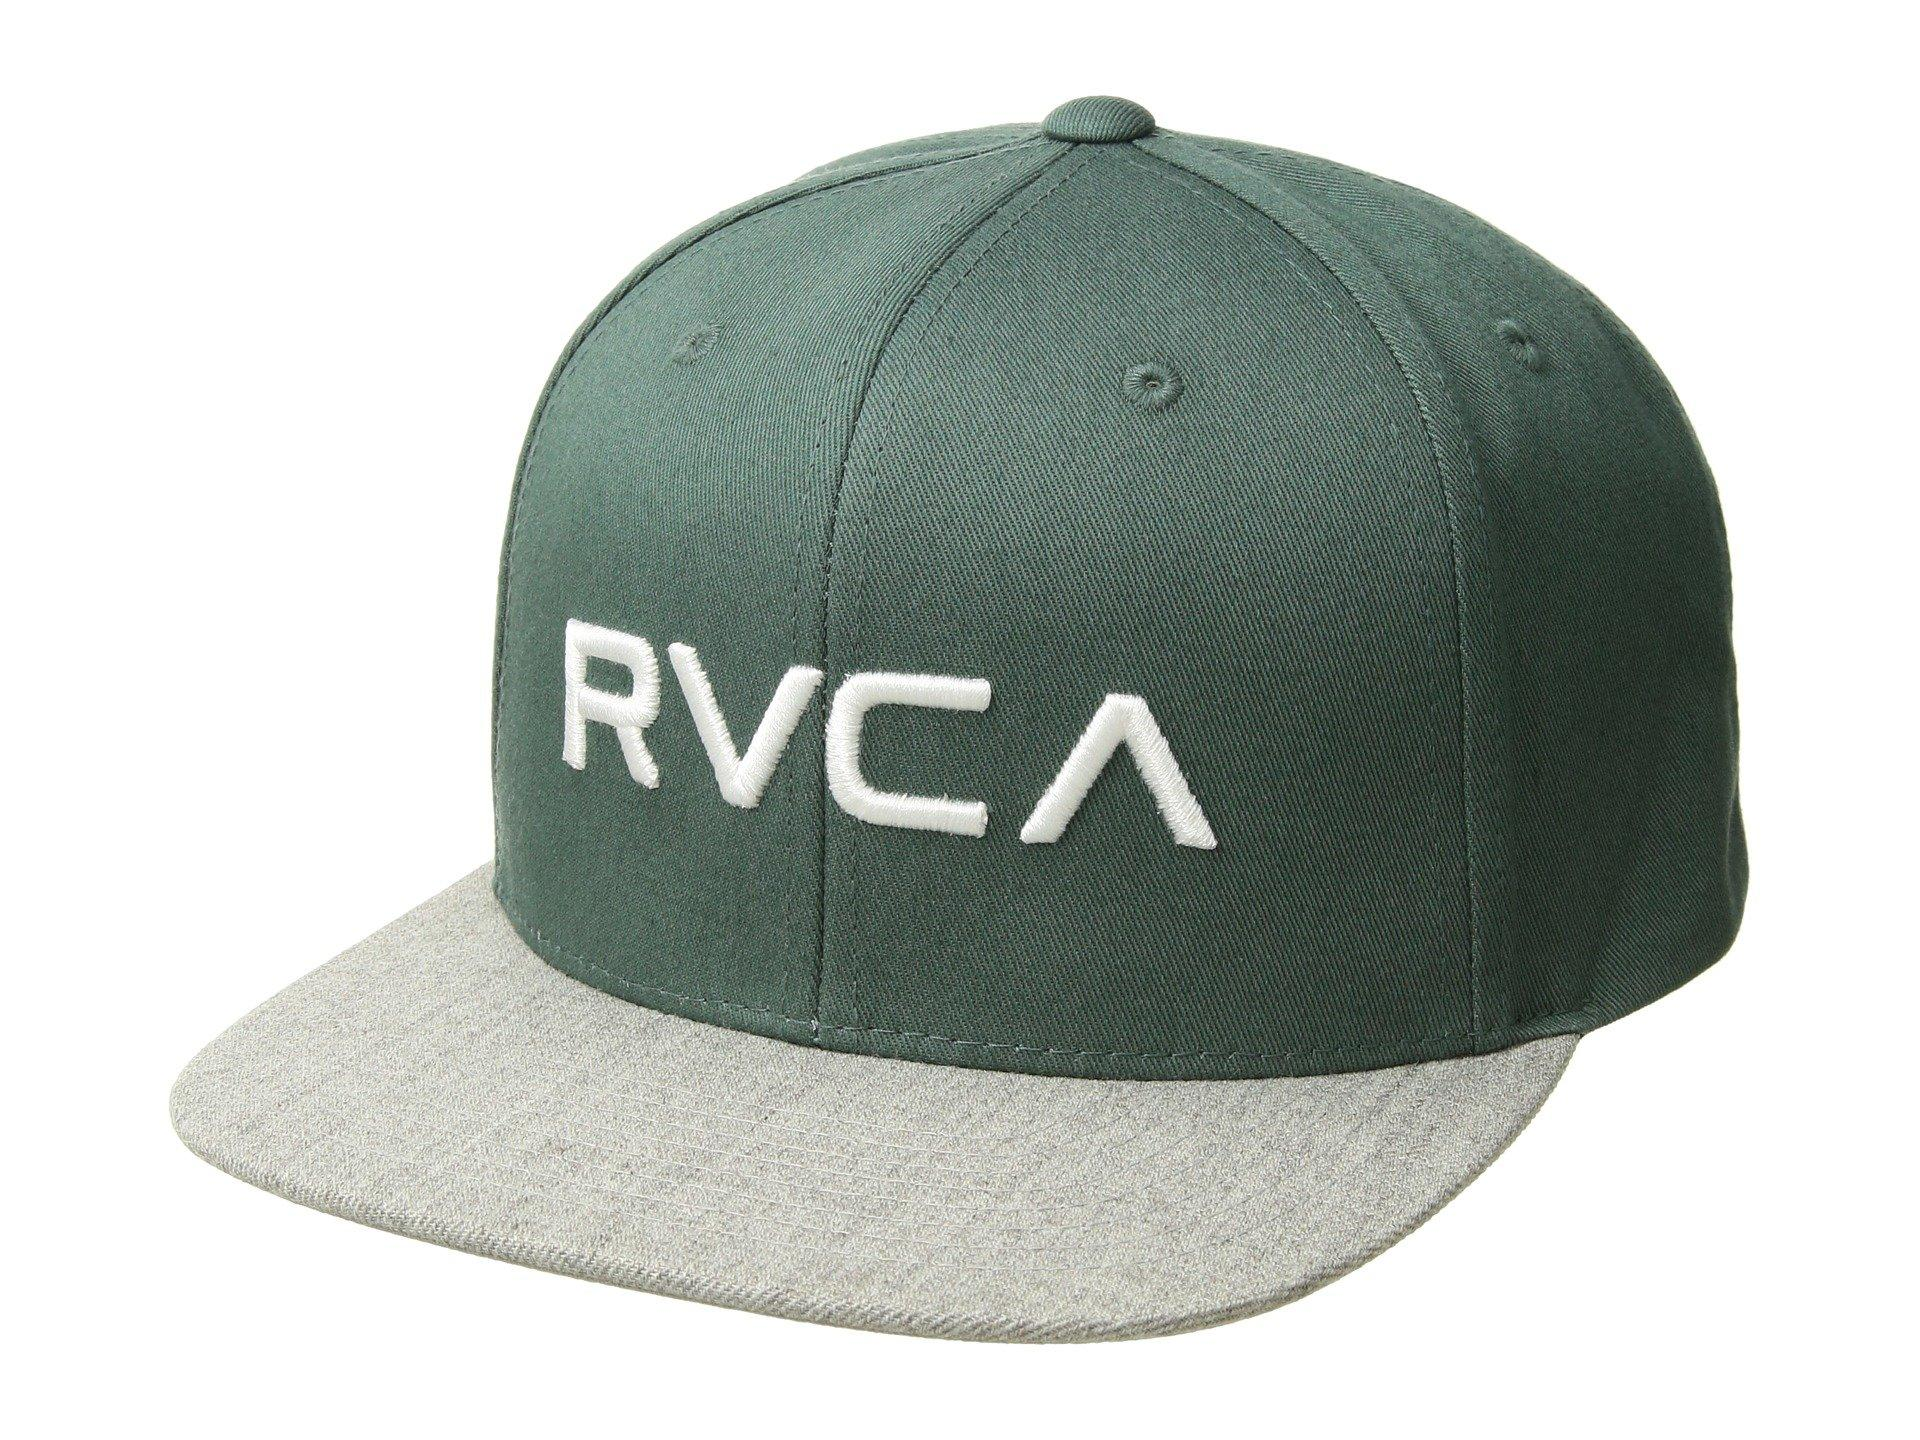 newest c0ca7 987d2 RVCA - Green Twill Snapback (navy red) Baseball Caps for Men - Lyst. View  fullscreen